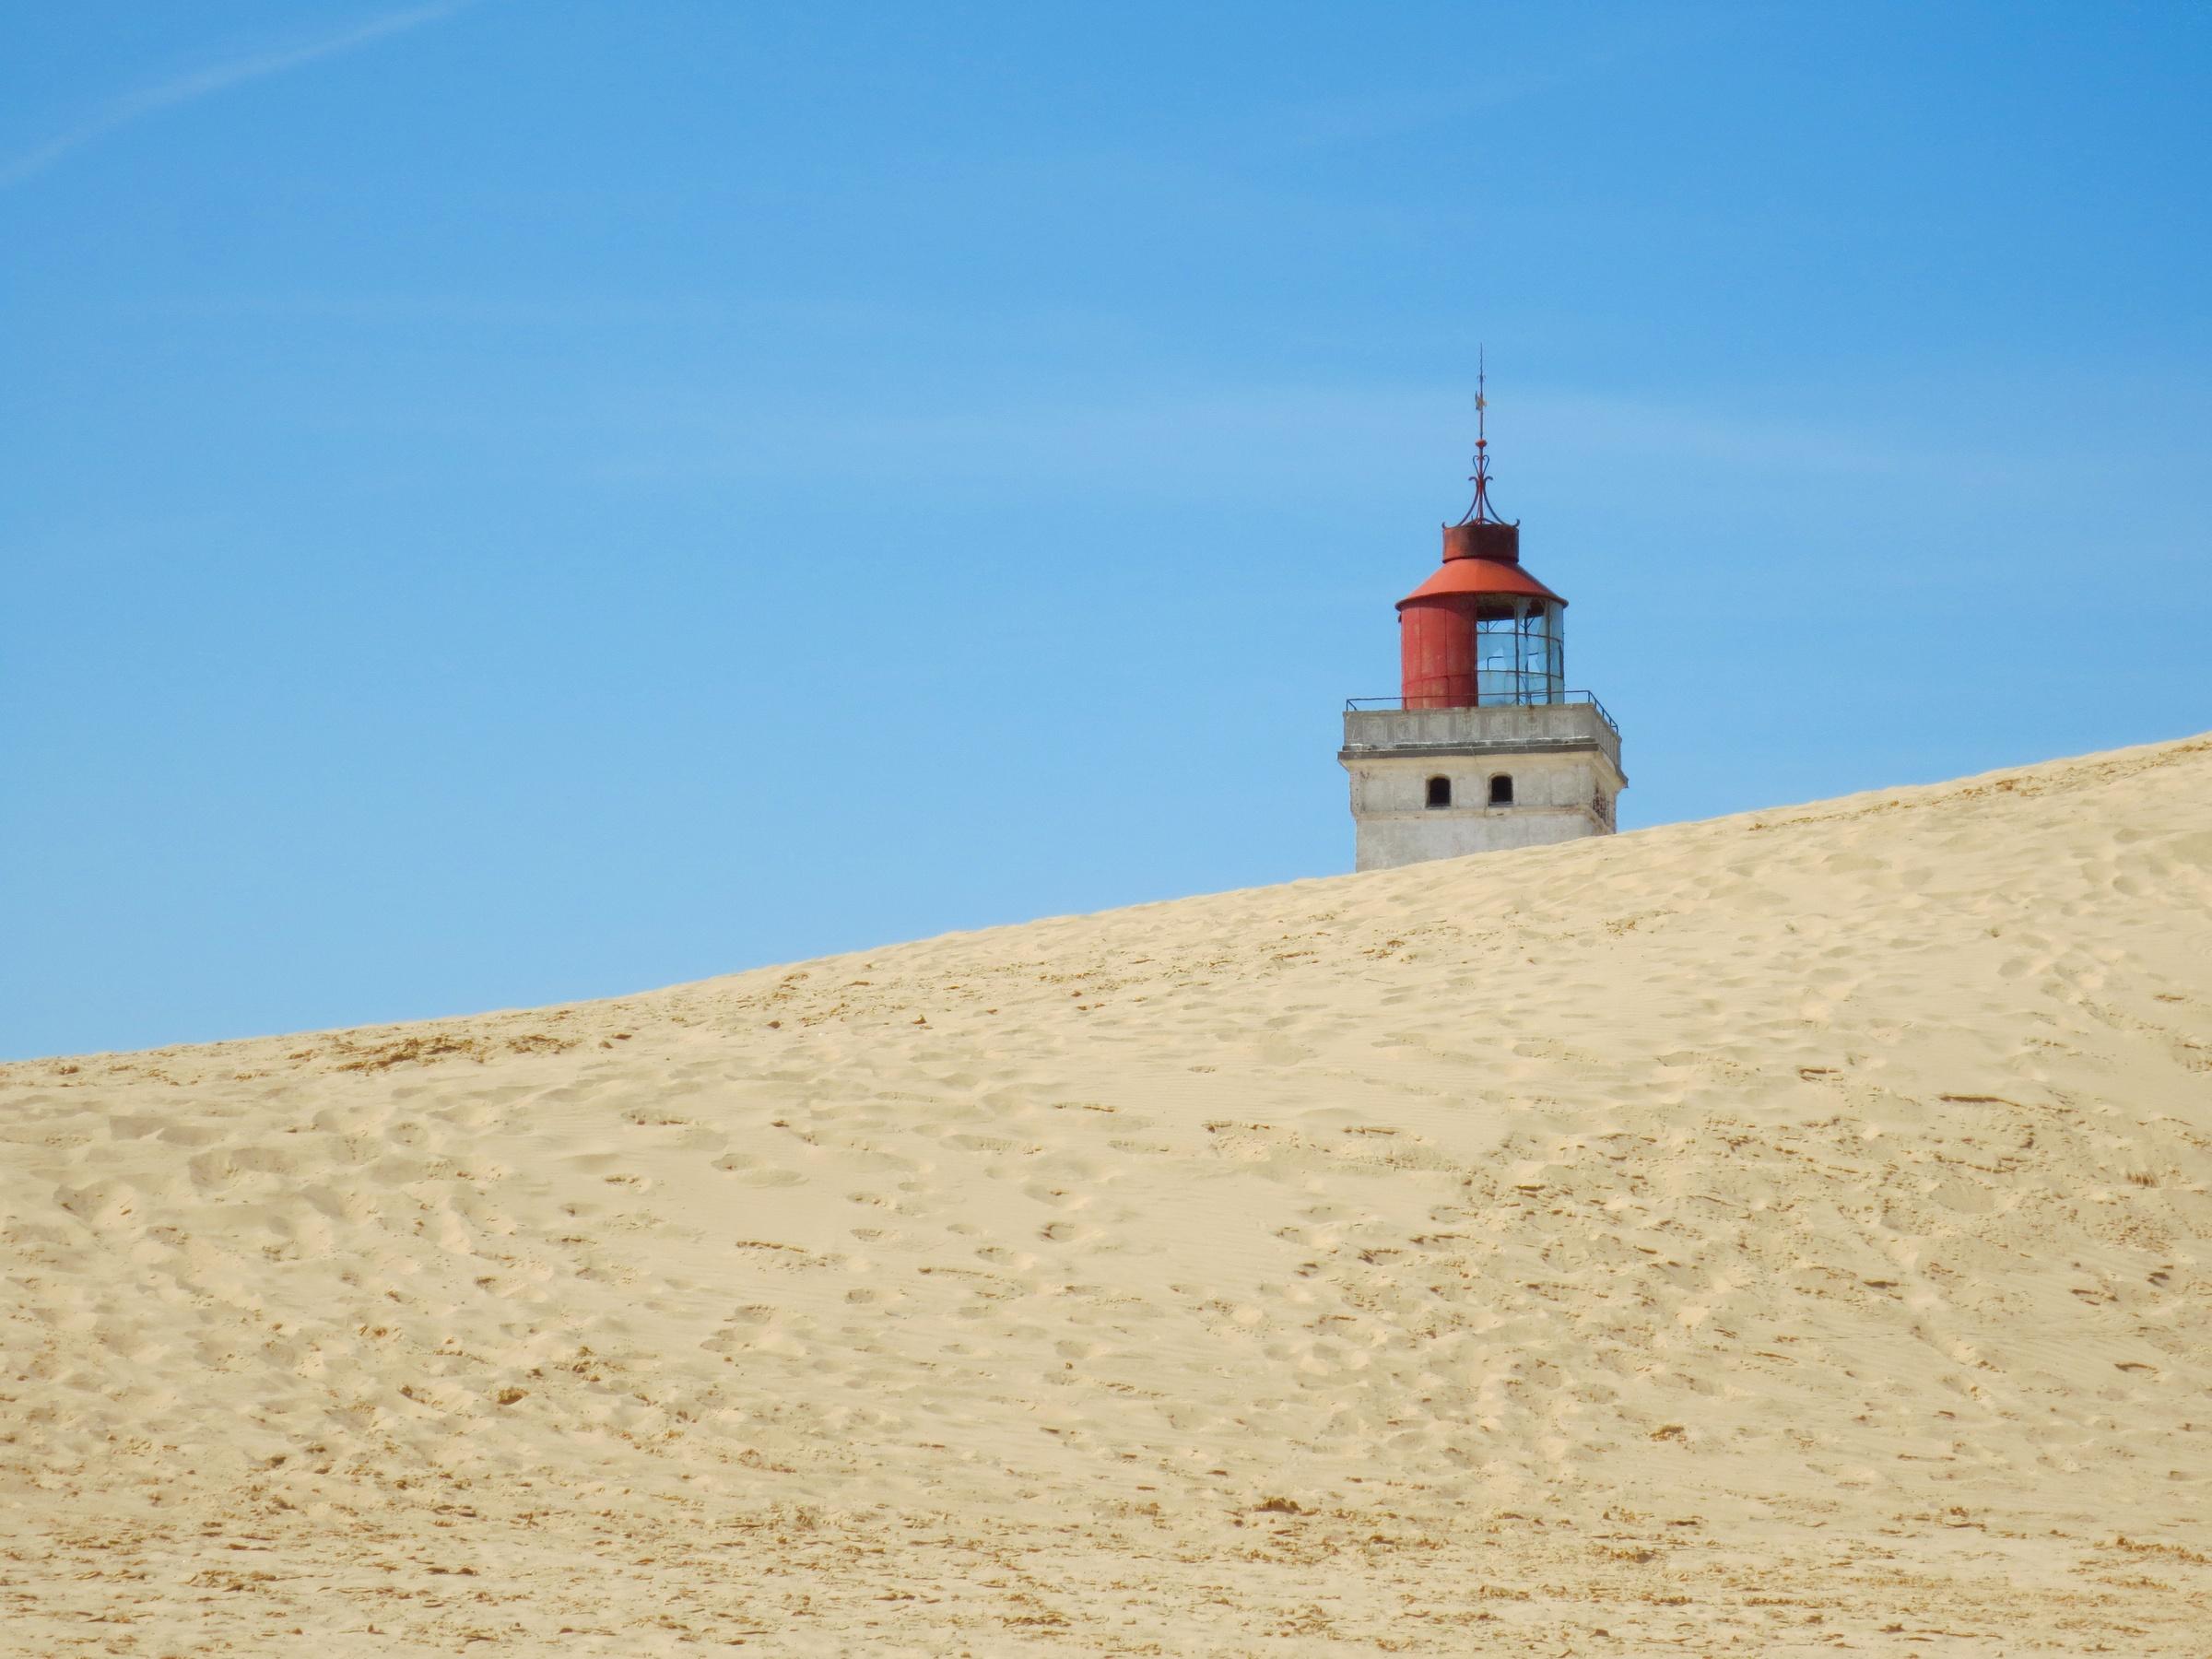 Versandeter Leuchtturm